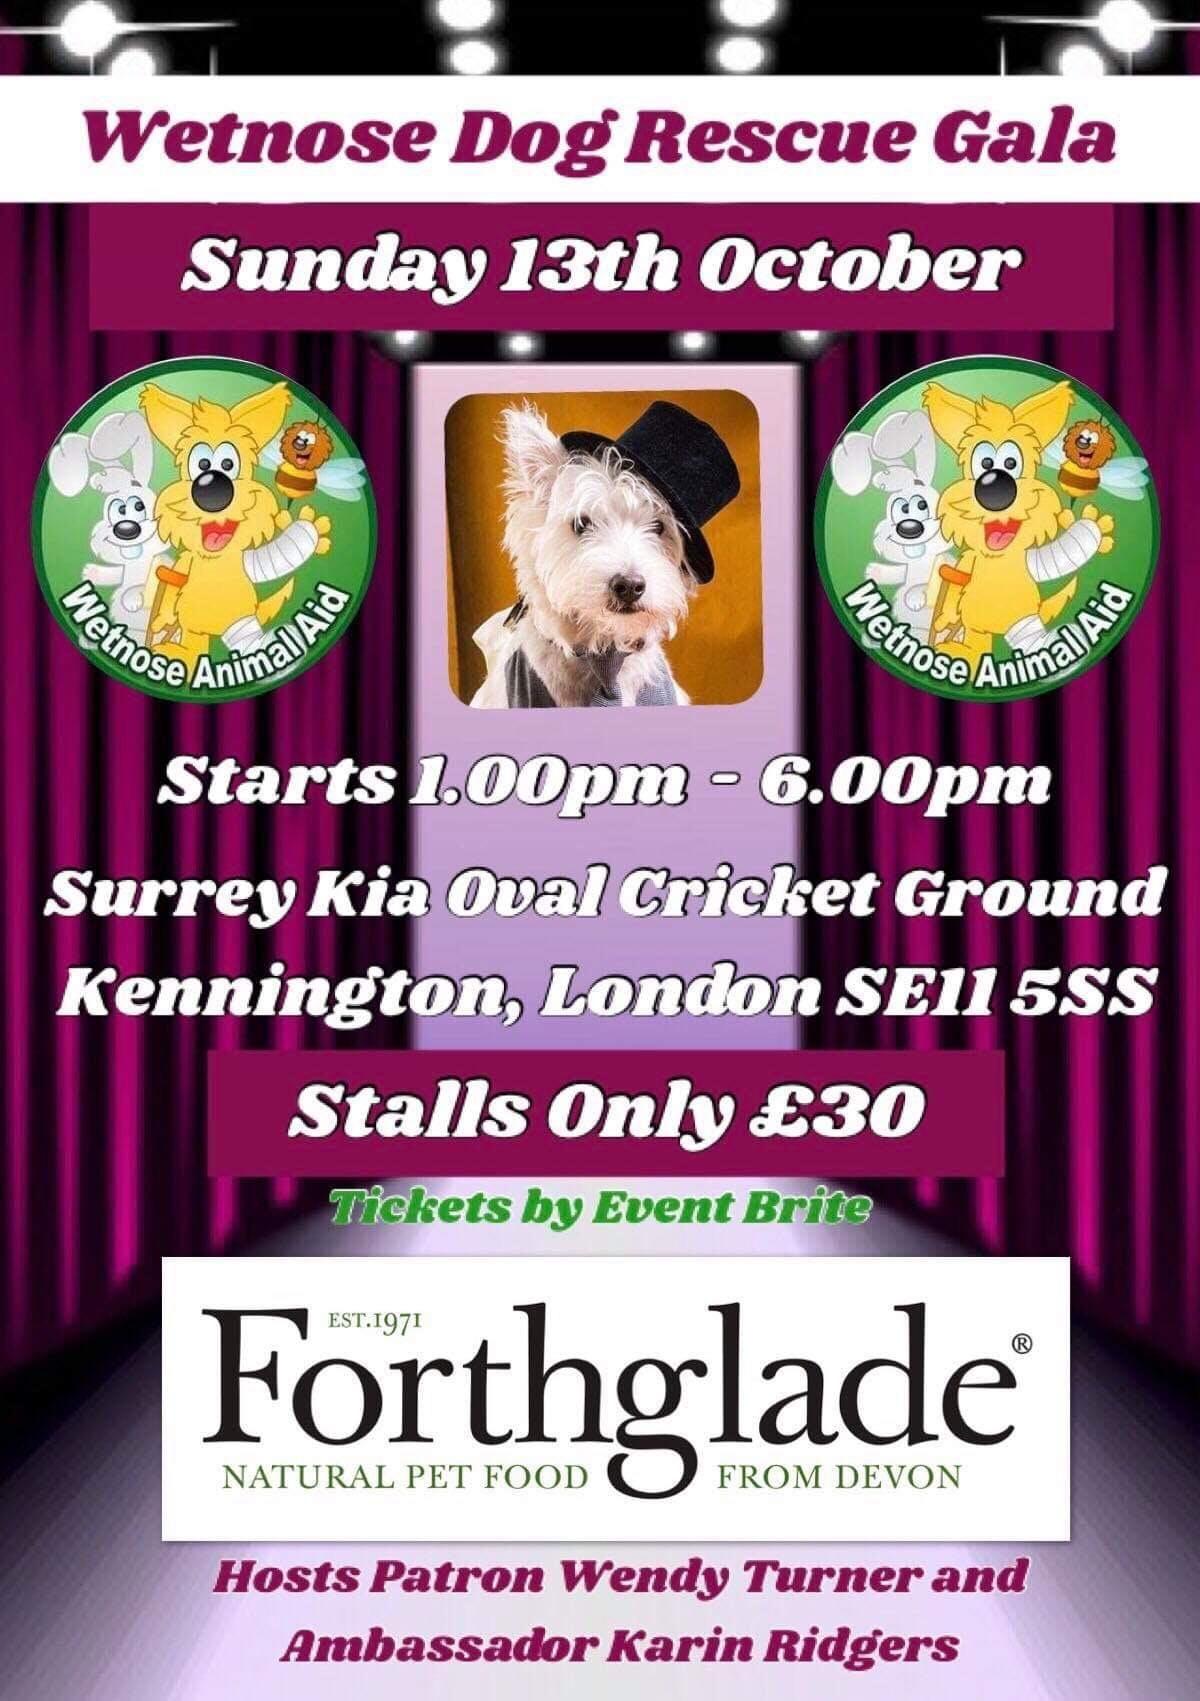 Wetnose Dog Rescue Gala